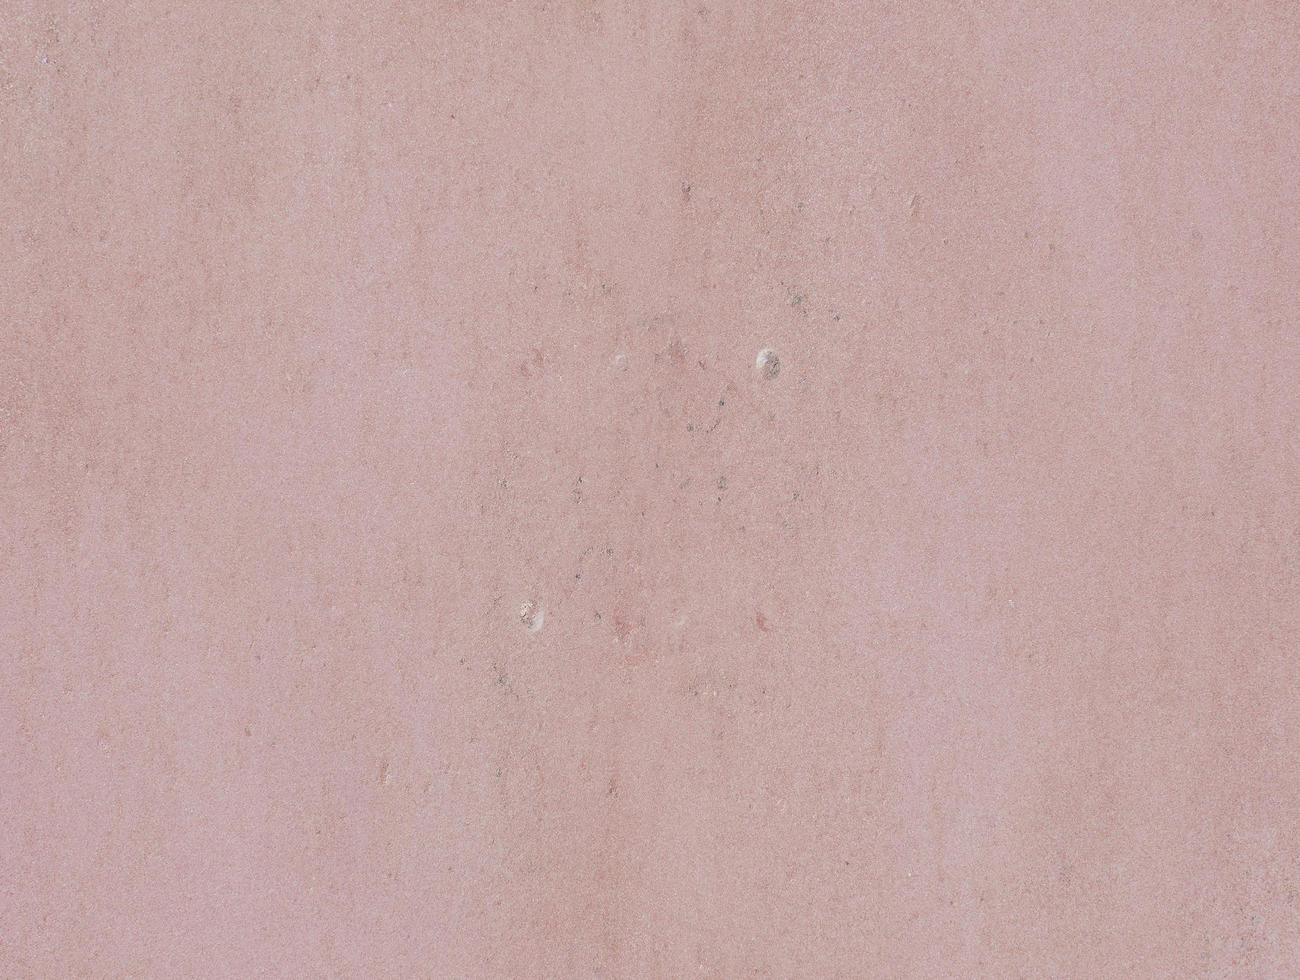 Pink wall texture photo